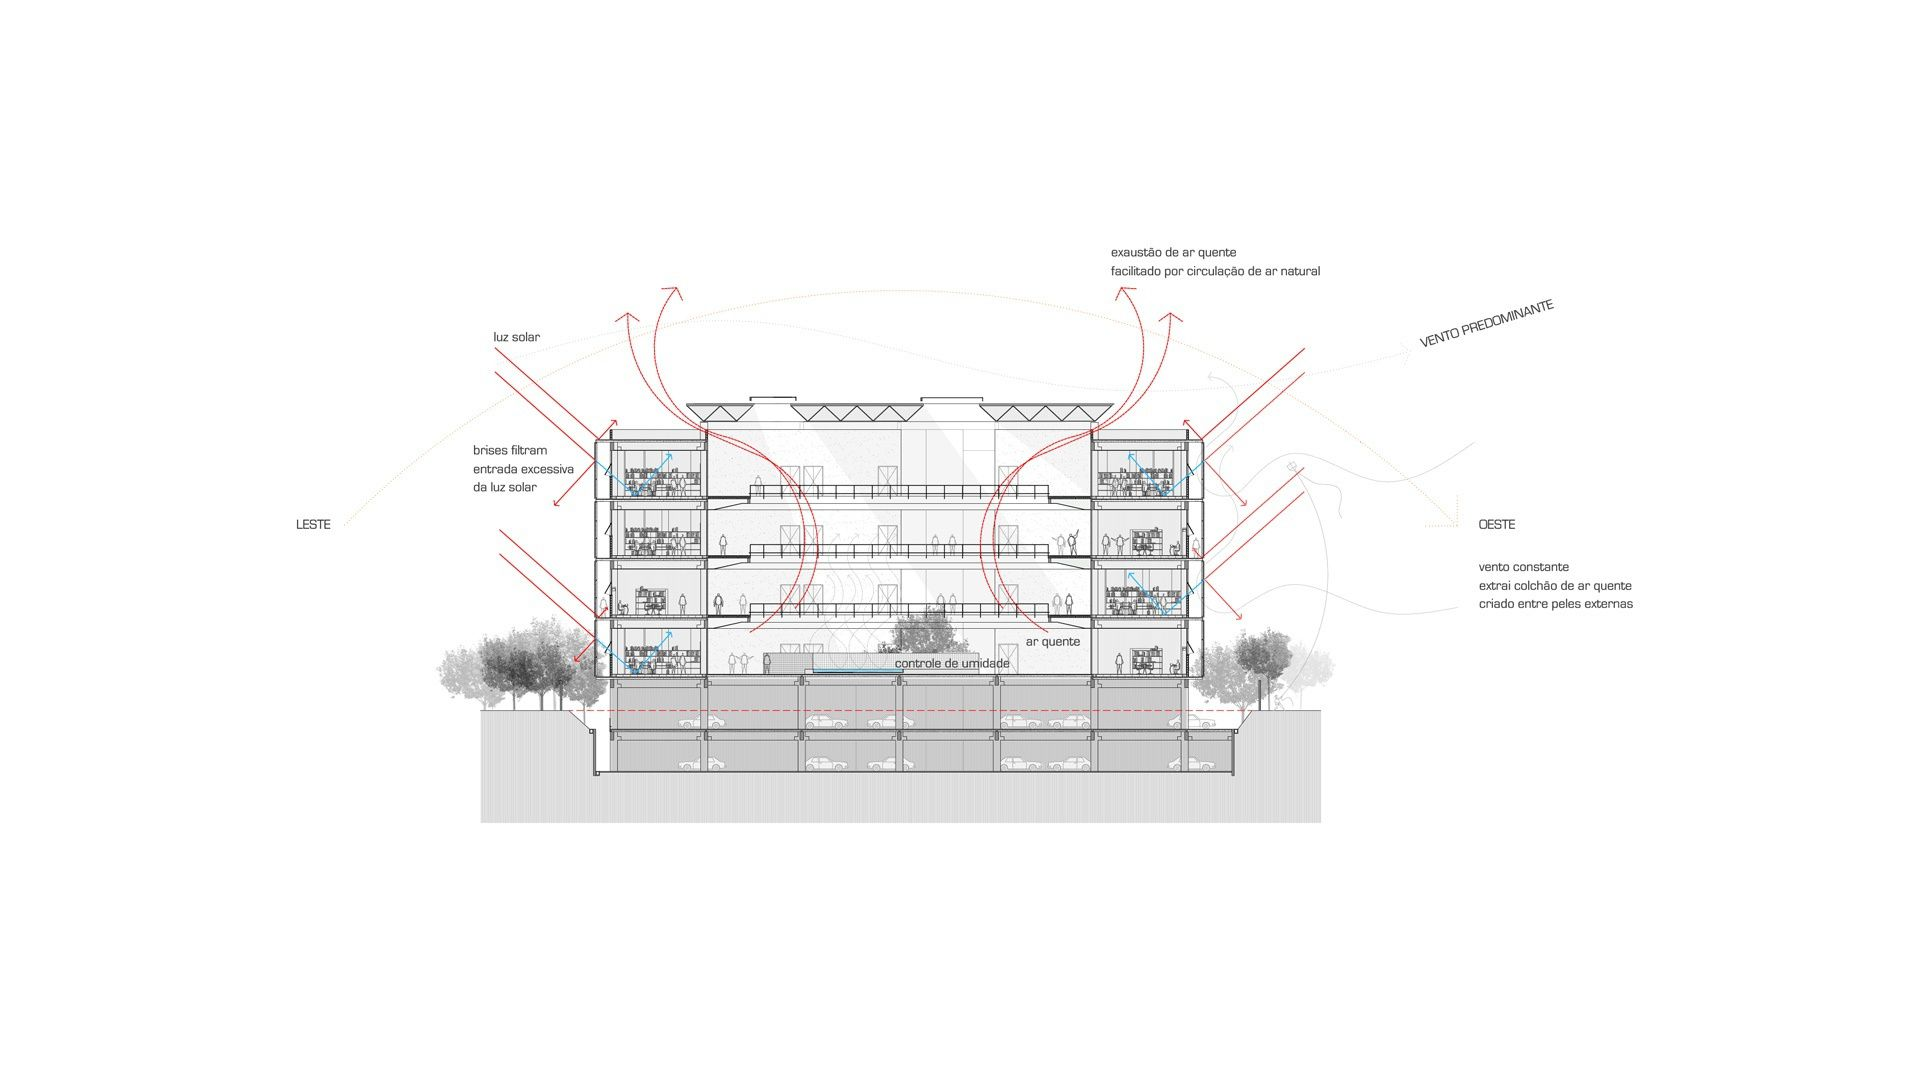 forum-diagrama-ventilacao-e-insolacao